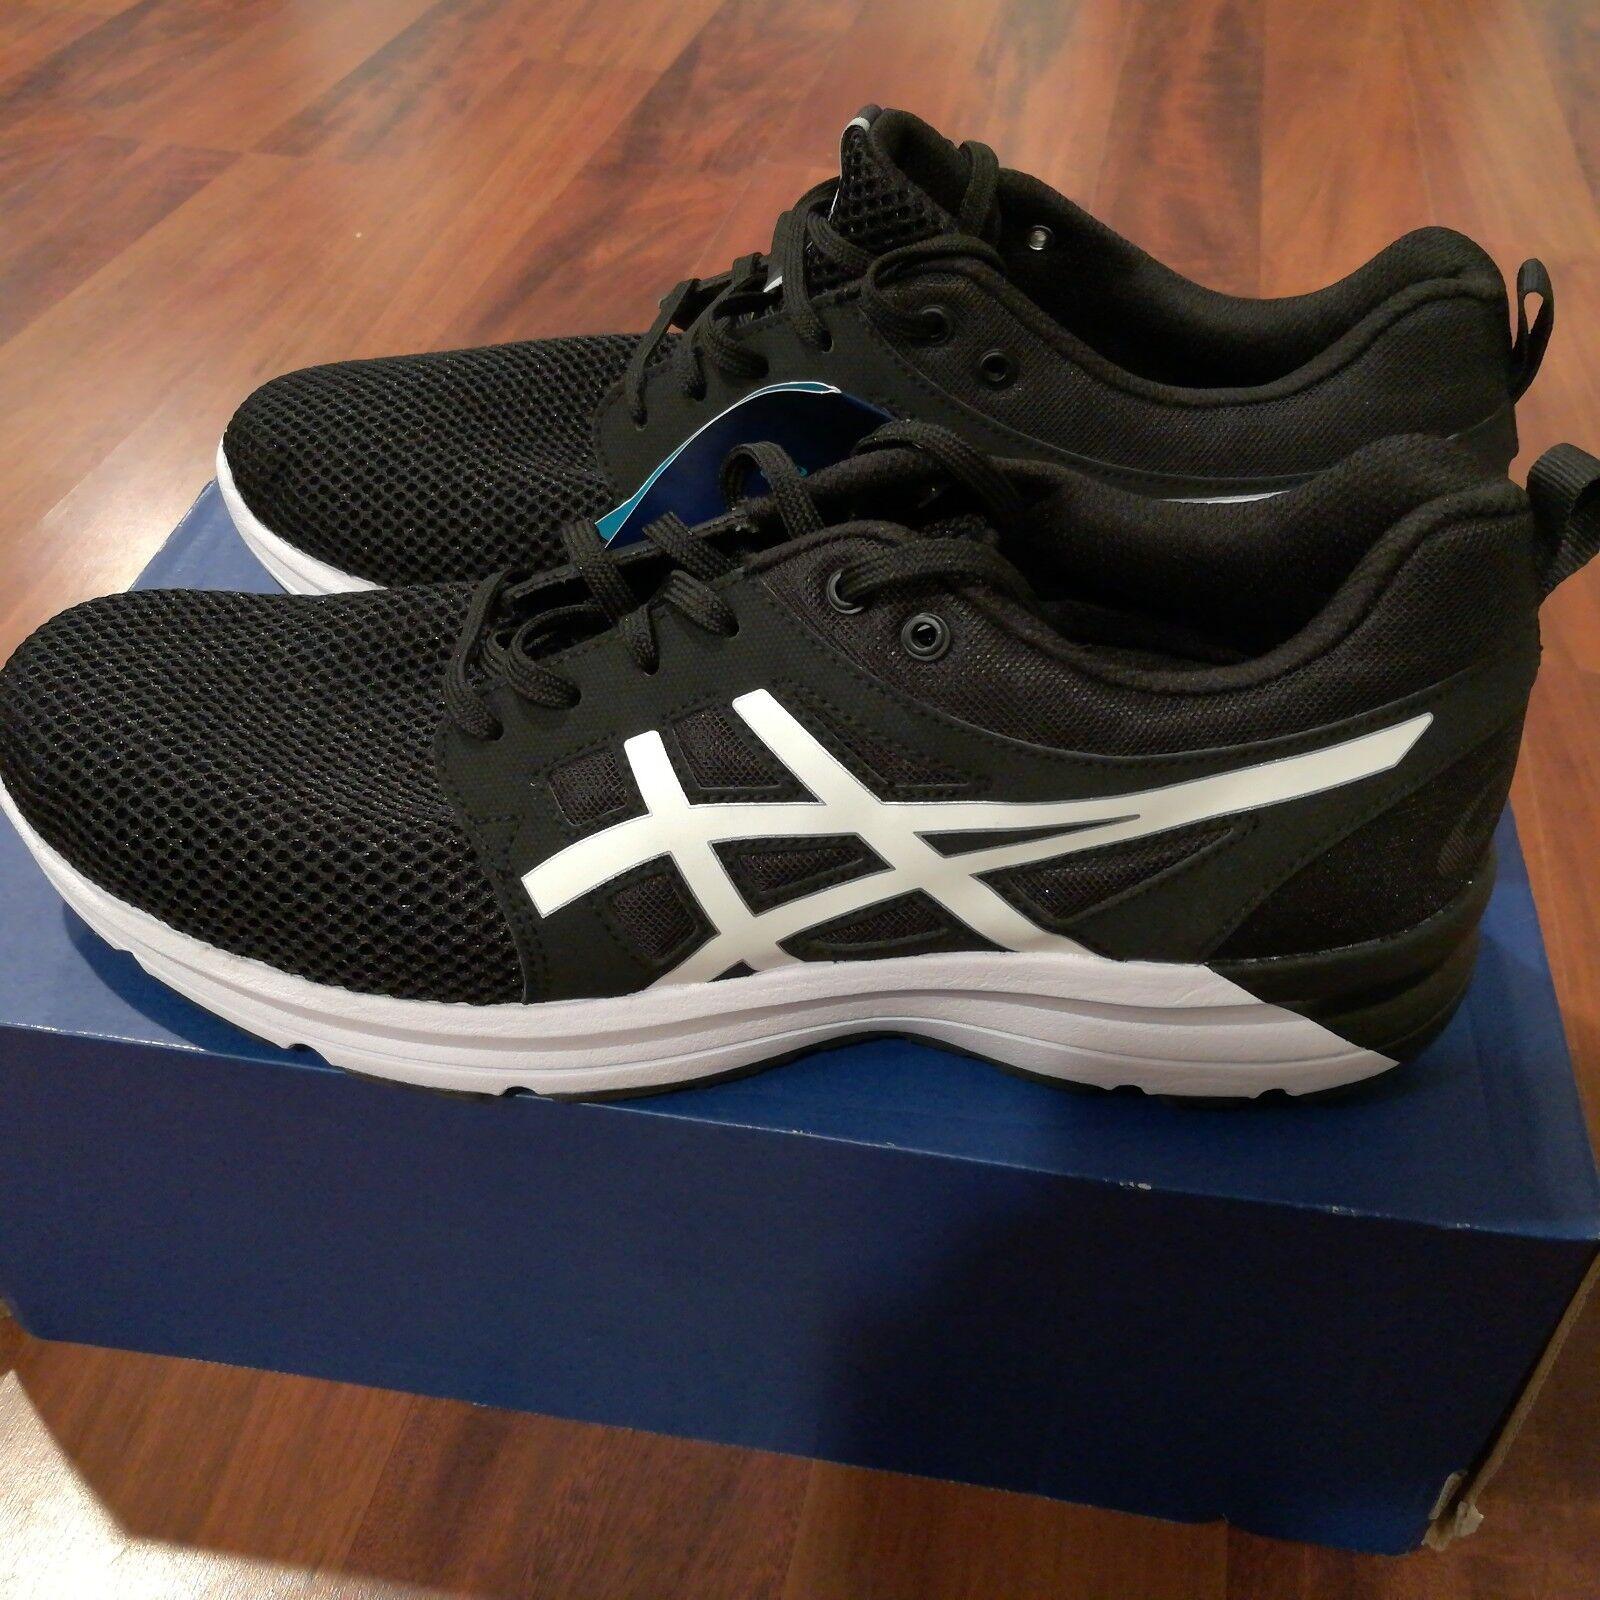 Asics Gel Torrance Homme Athlétique Chaussures De Course Noir Blanc Taille 11.5 NEW IN BOX